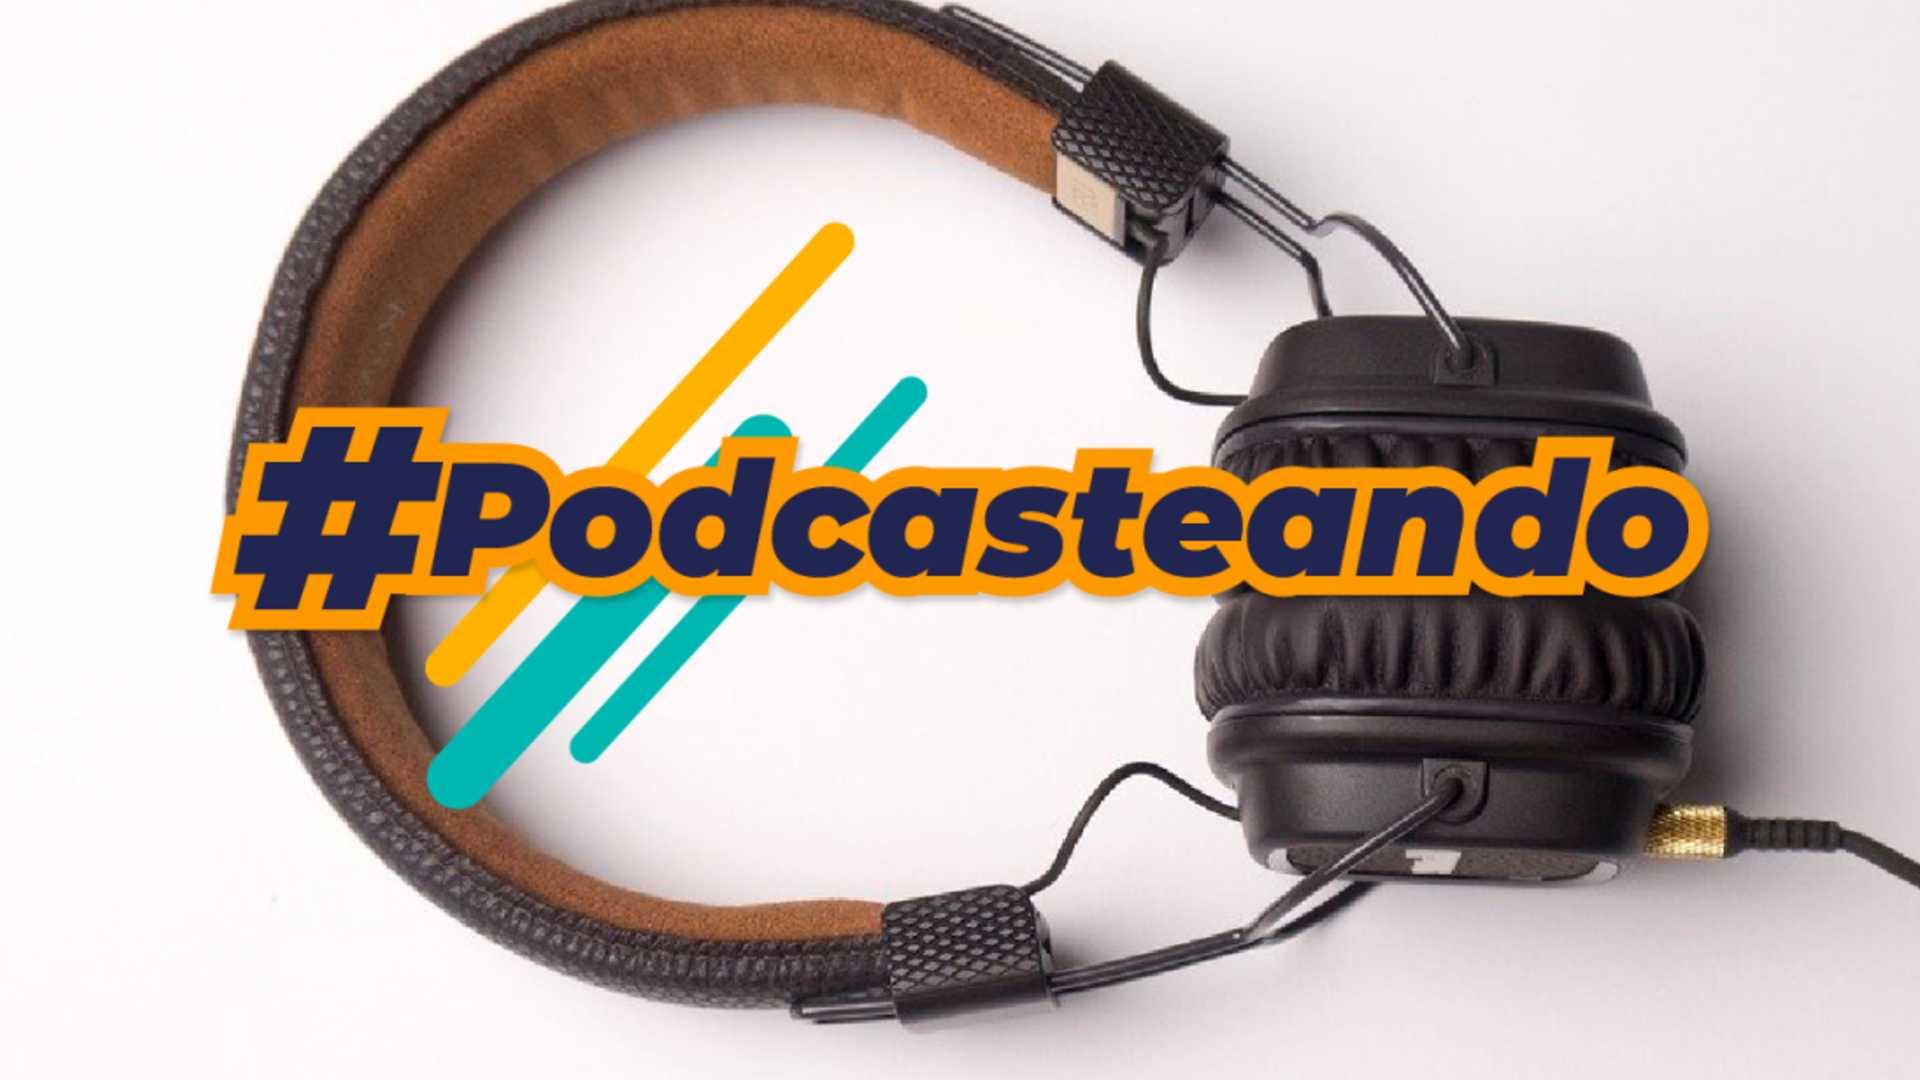 Podcasteando, serie de podcast Al Oído